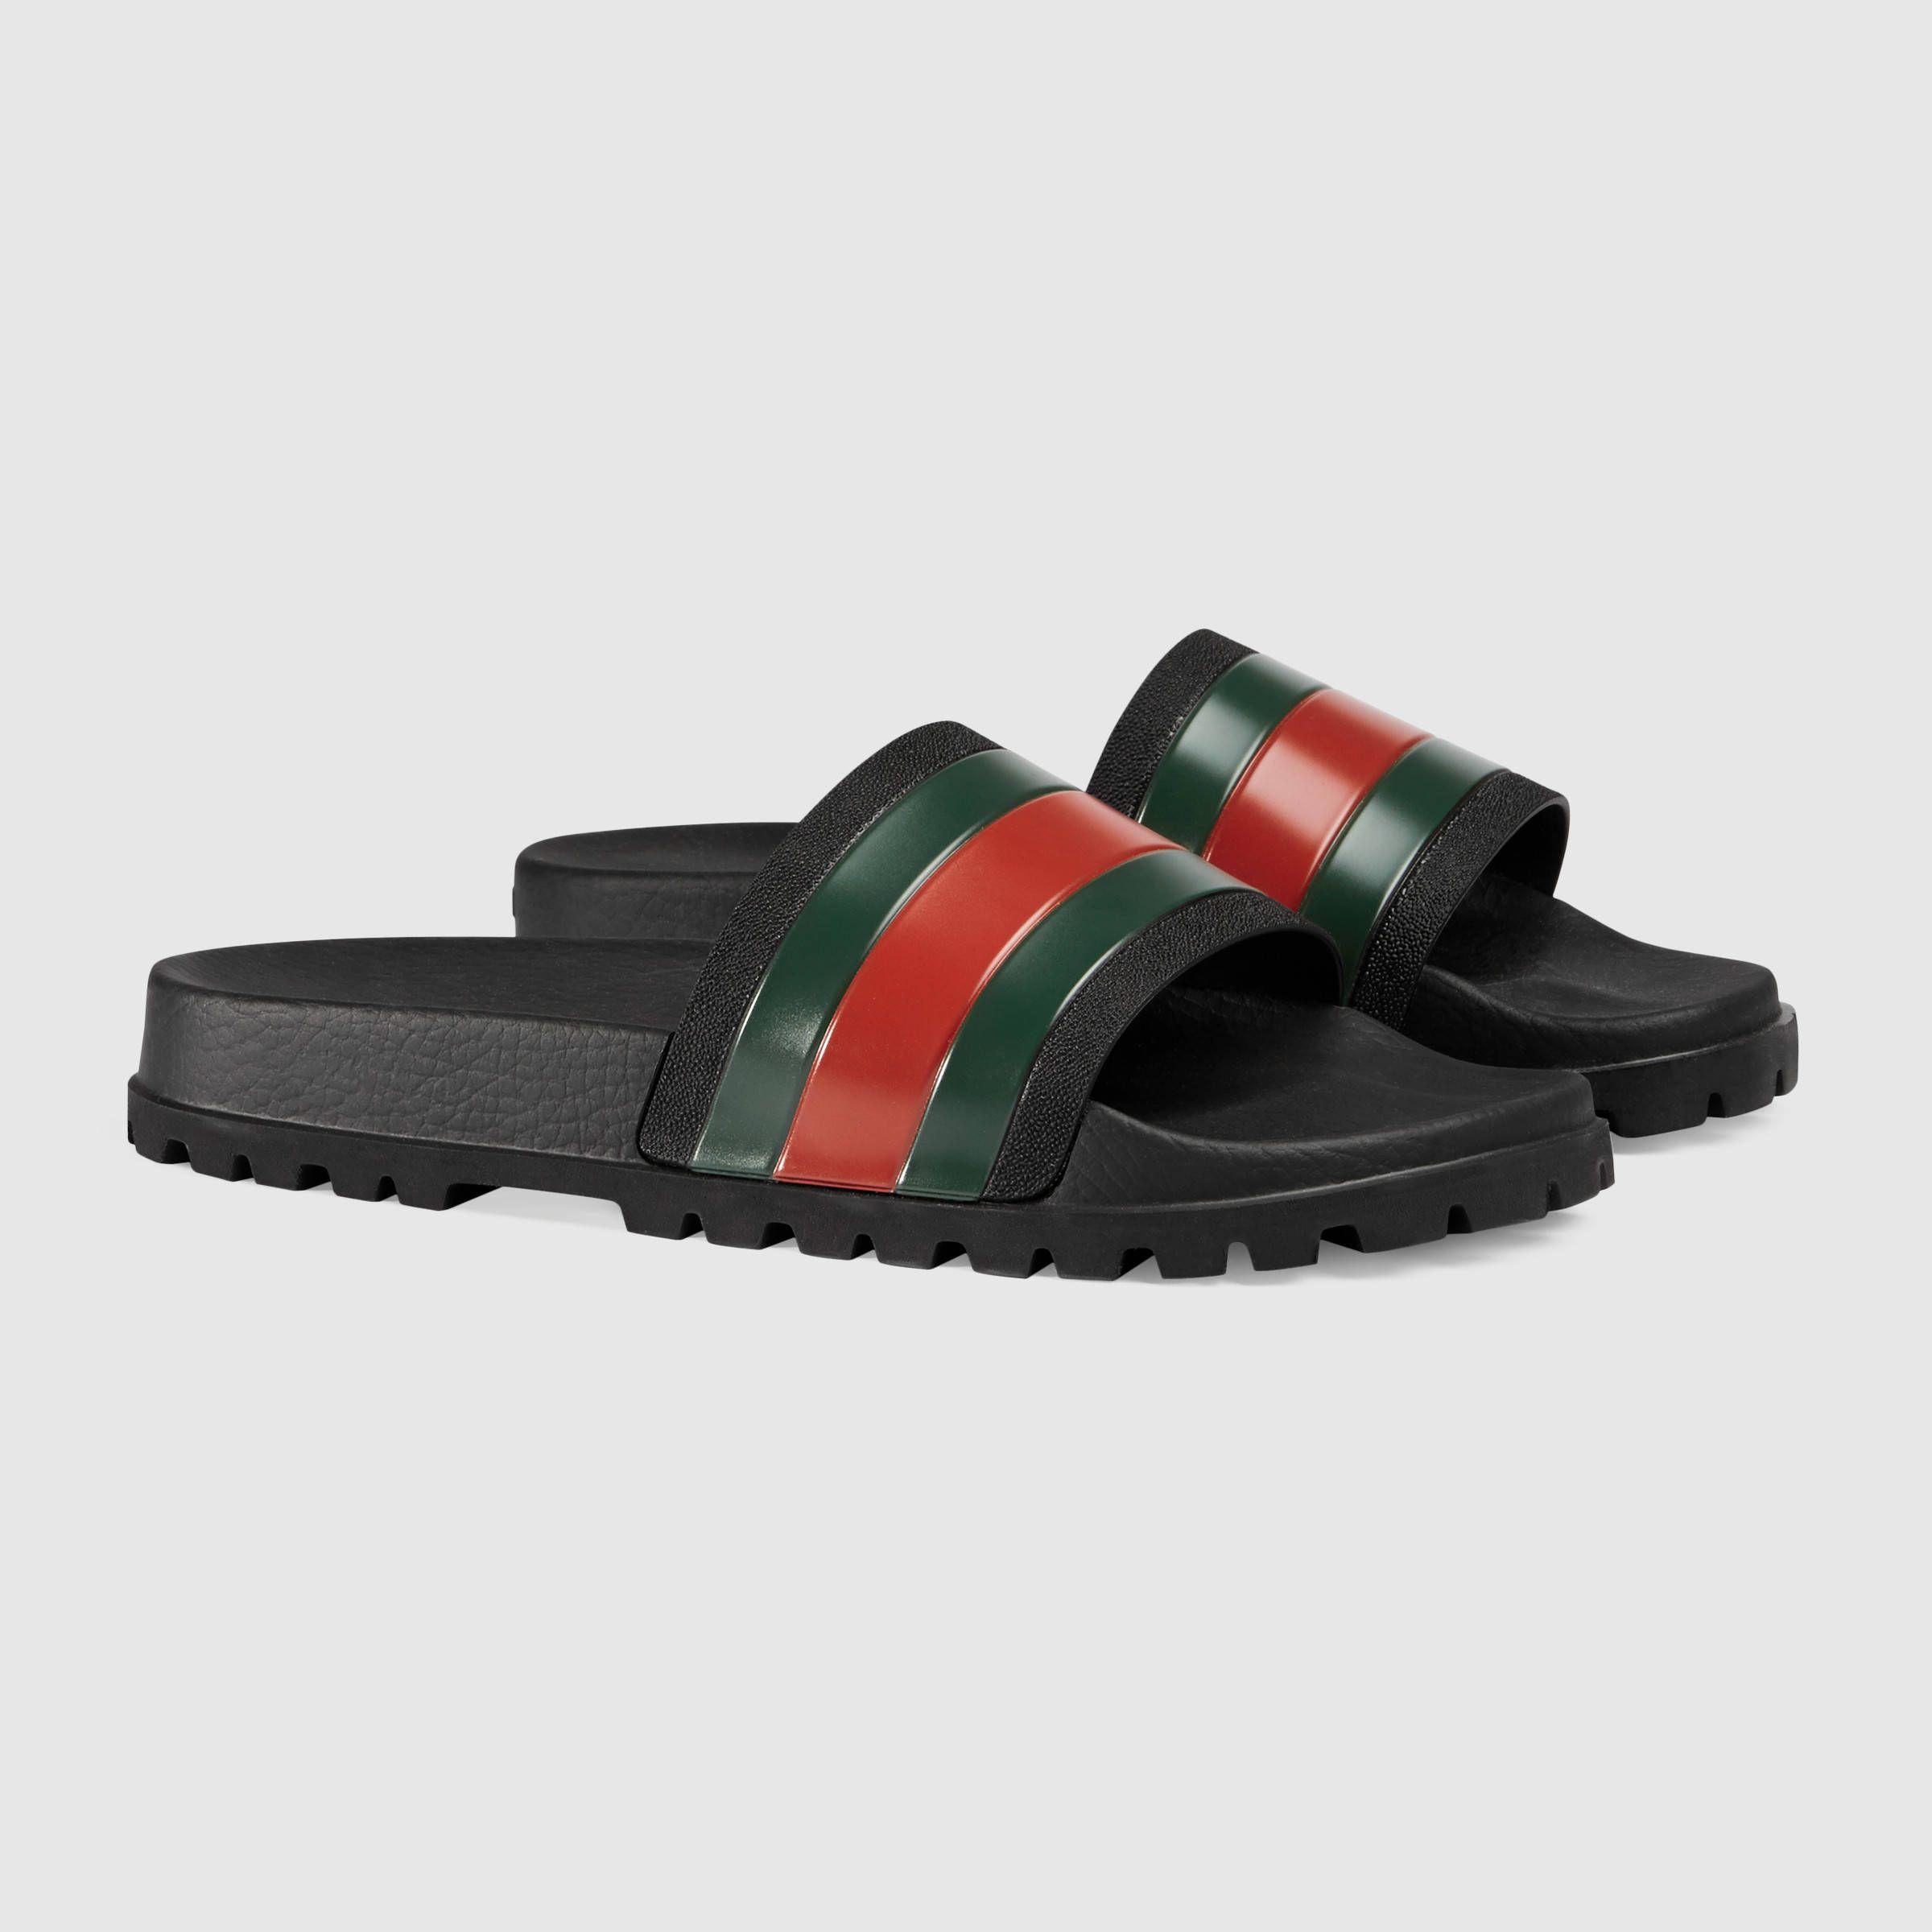 Gucci slipper, Mens sandals, Slide sandals